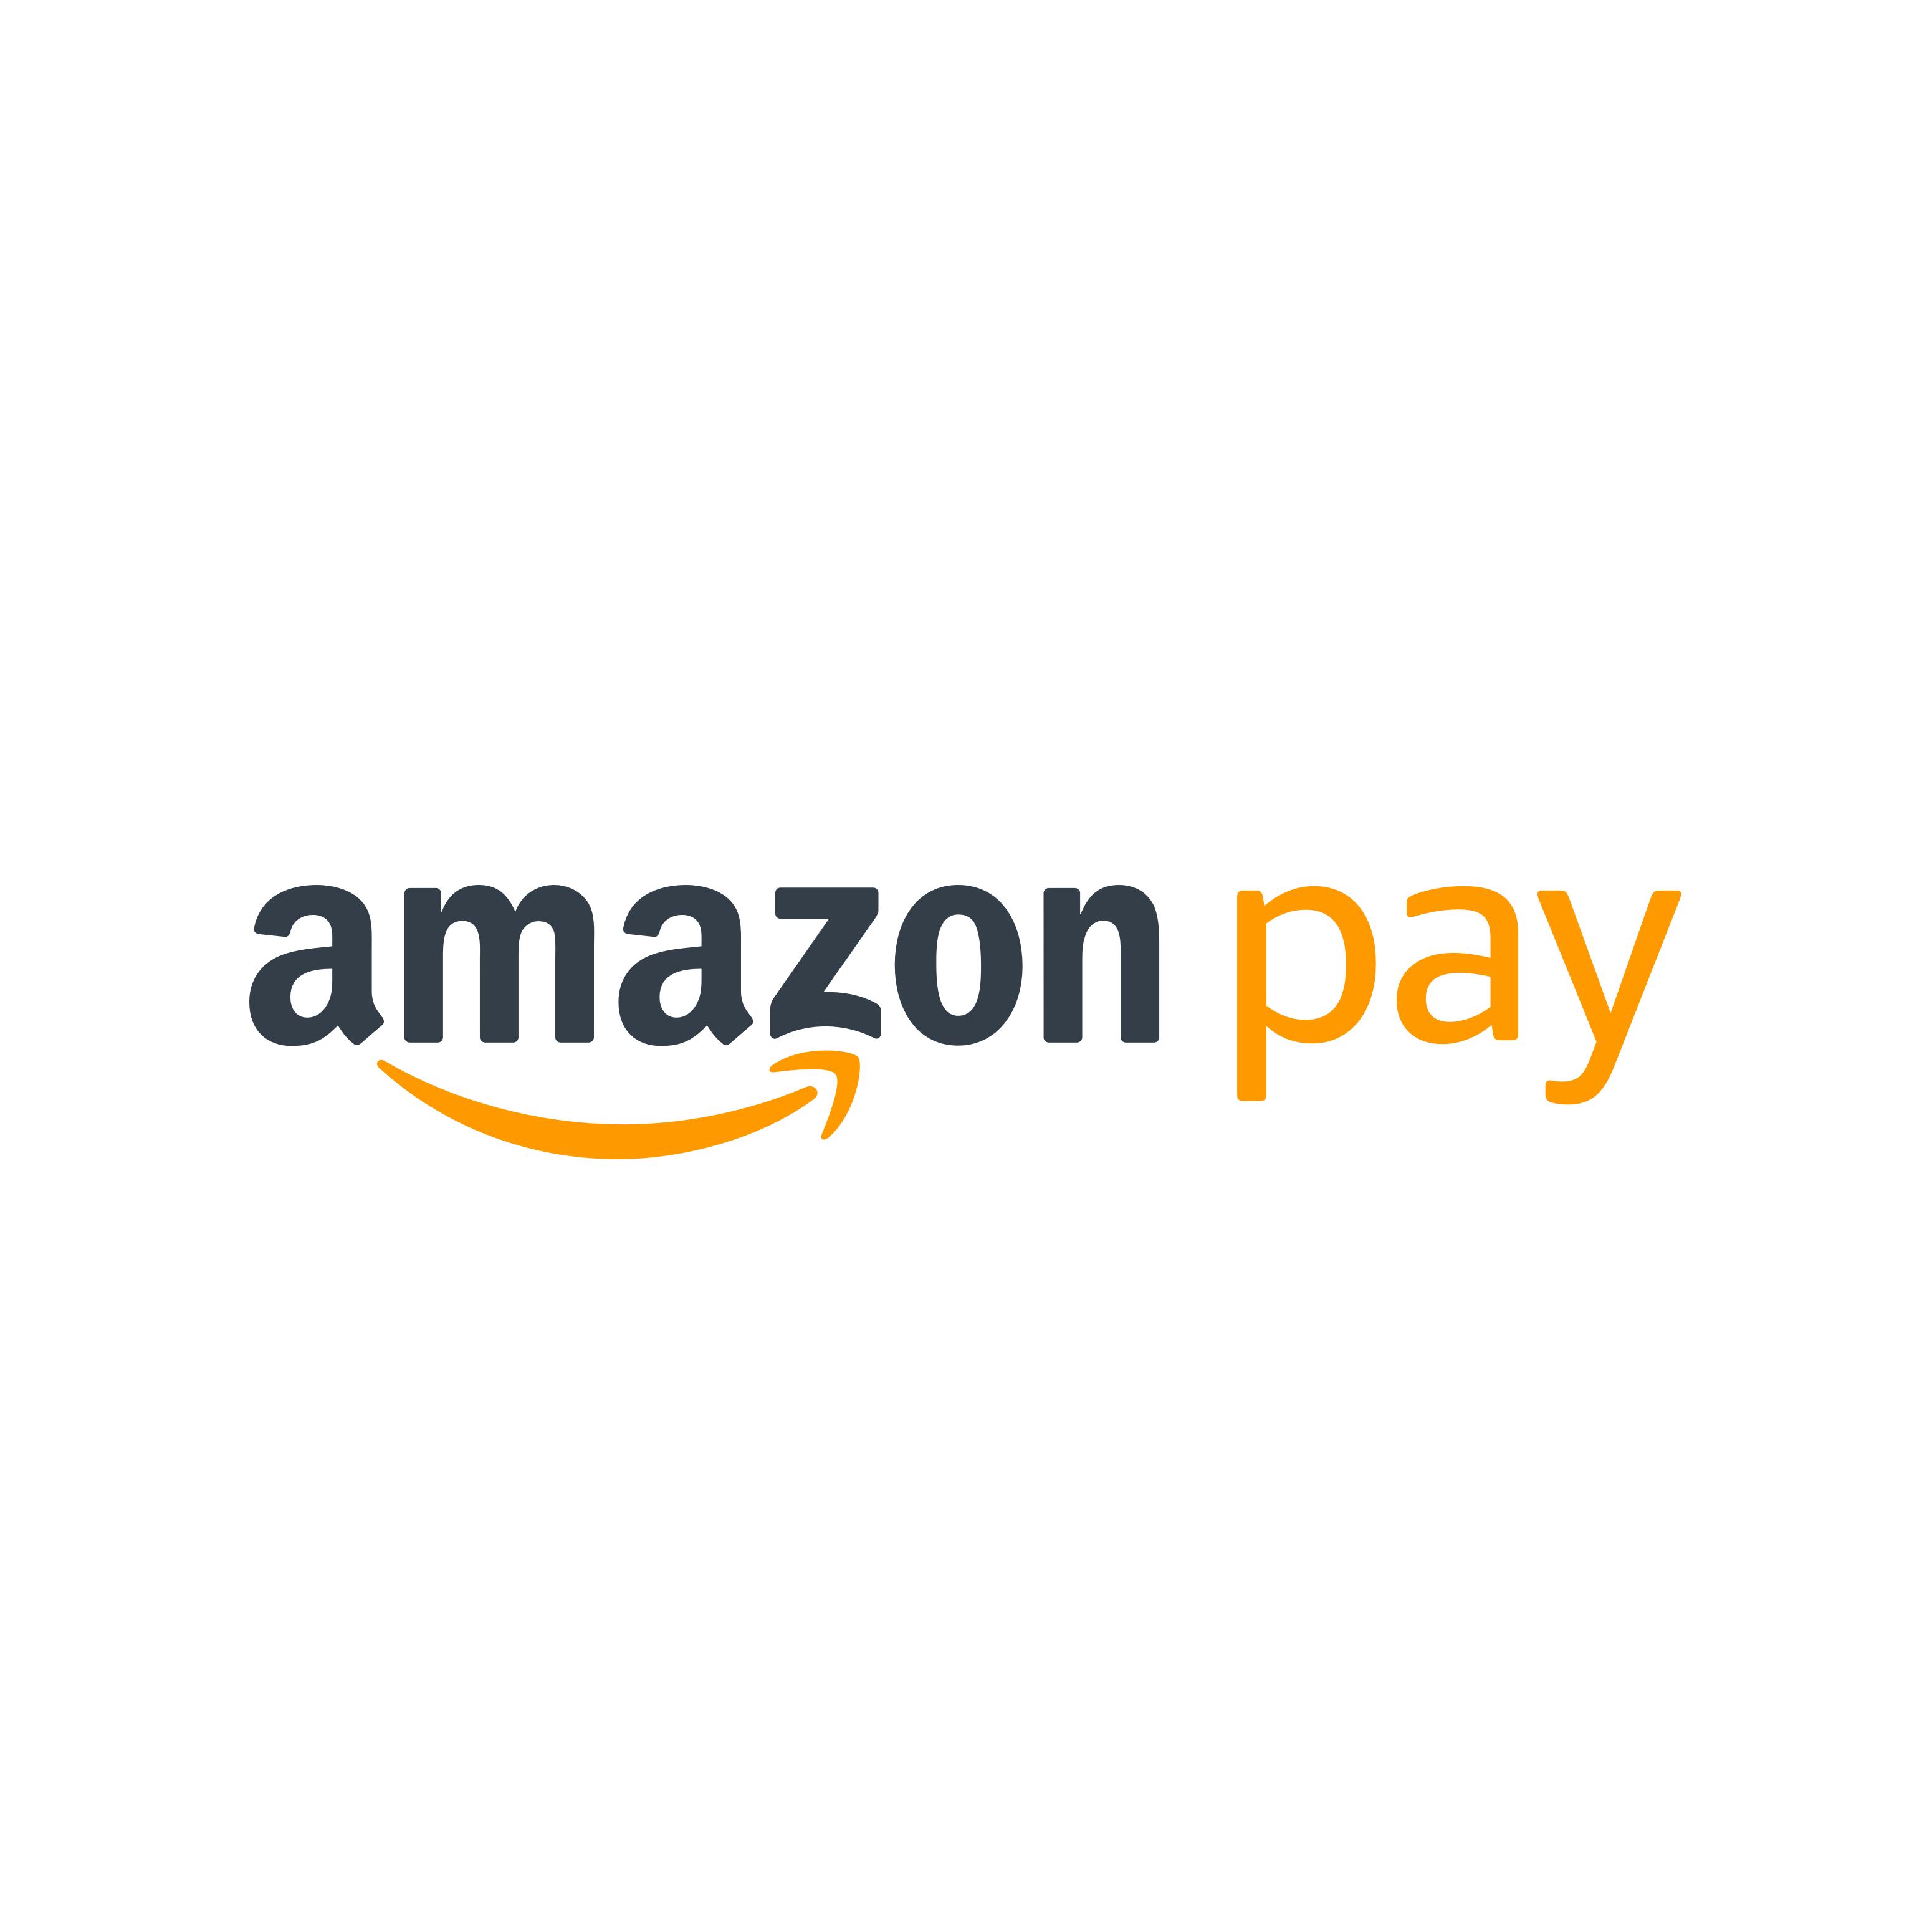 amazonpay-offers